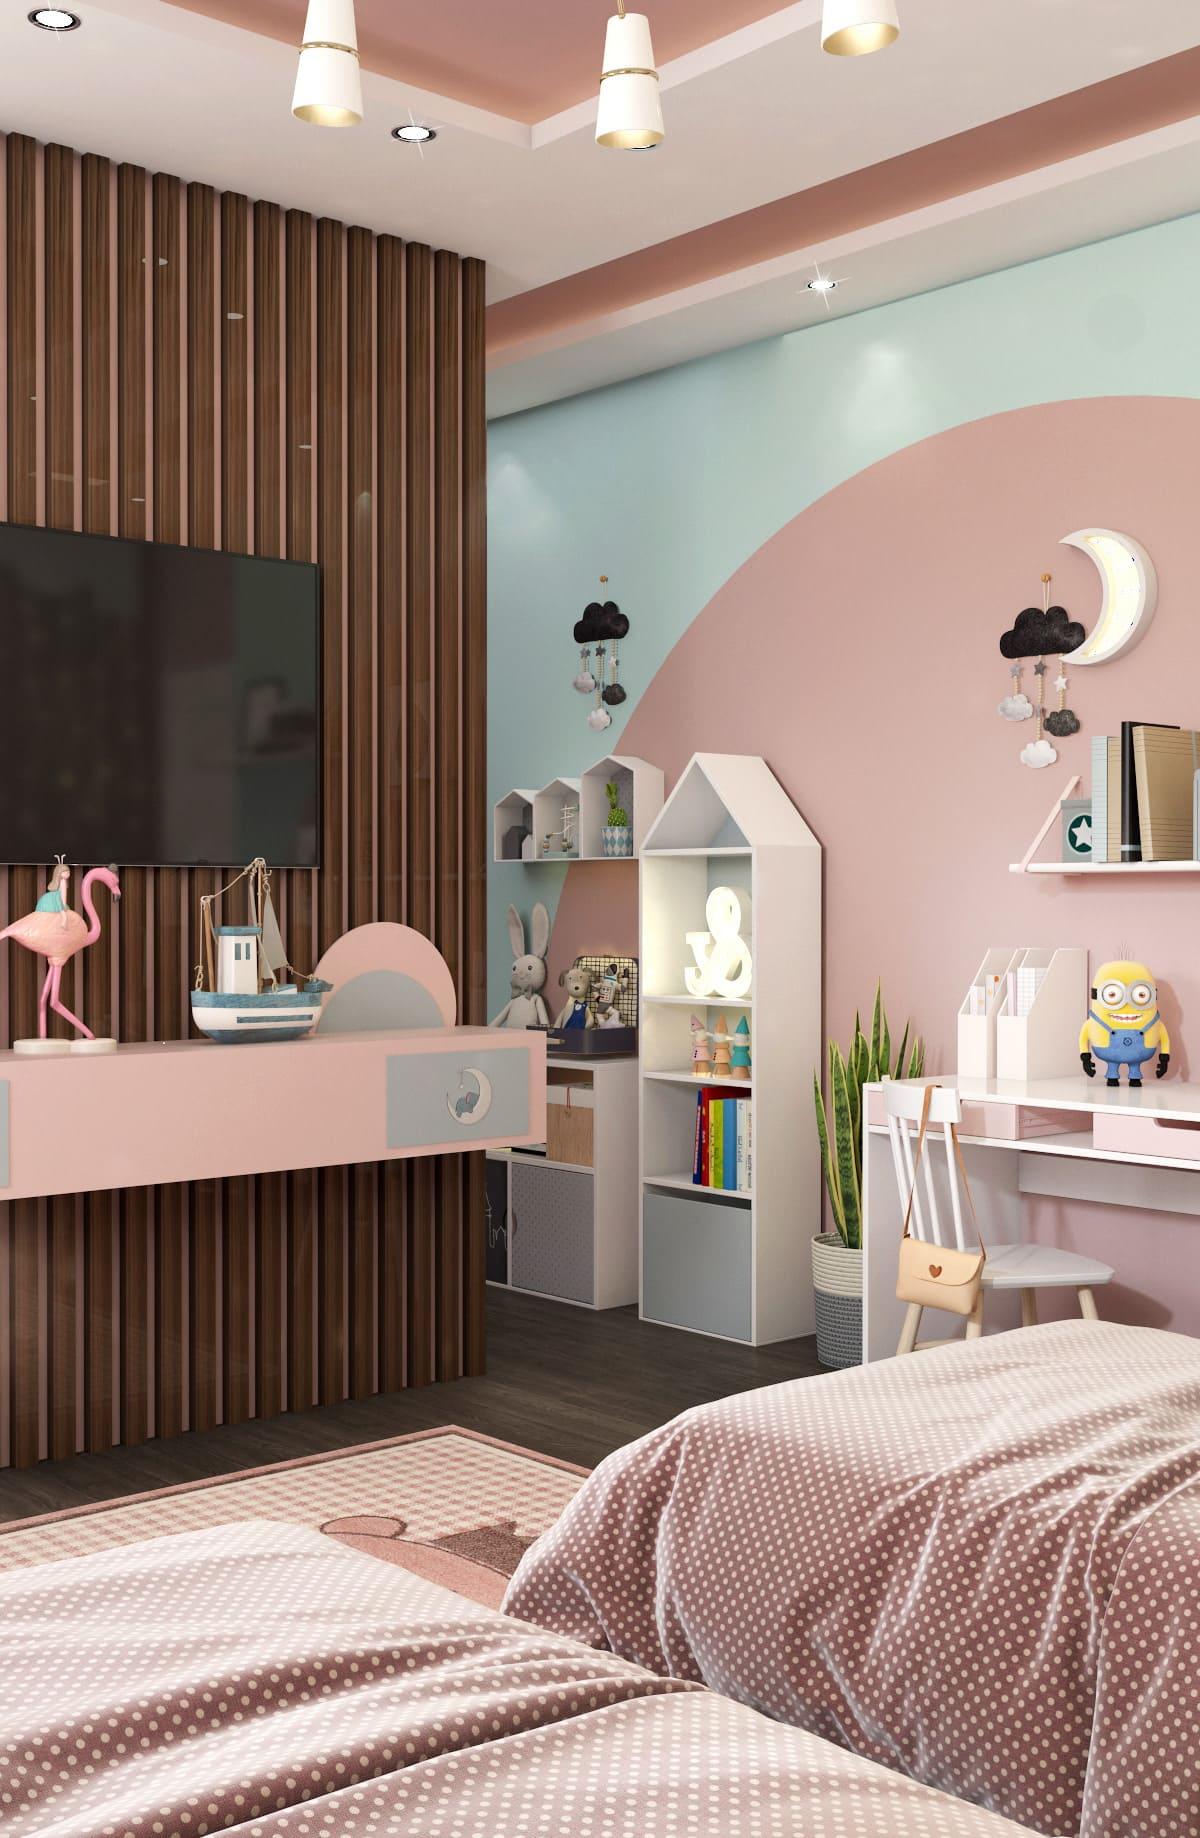 интерьер детской комнаты фото 87